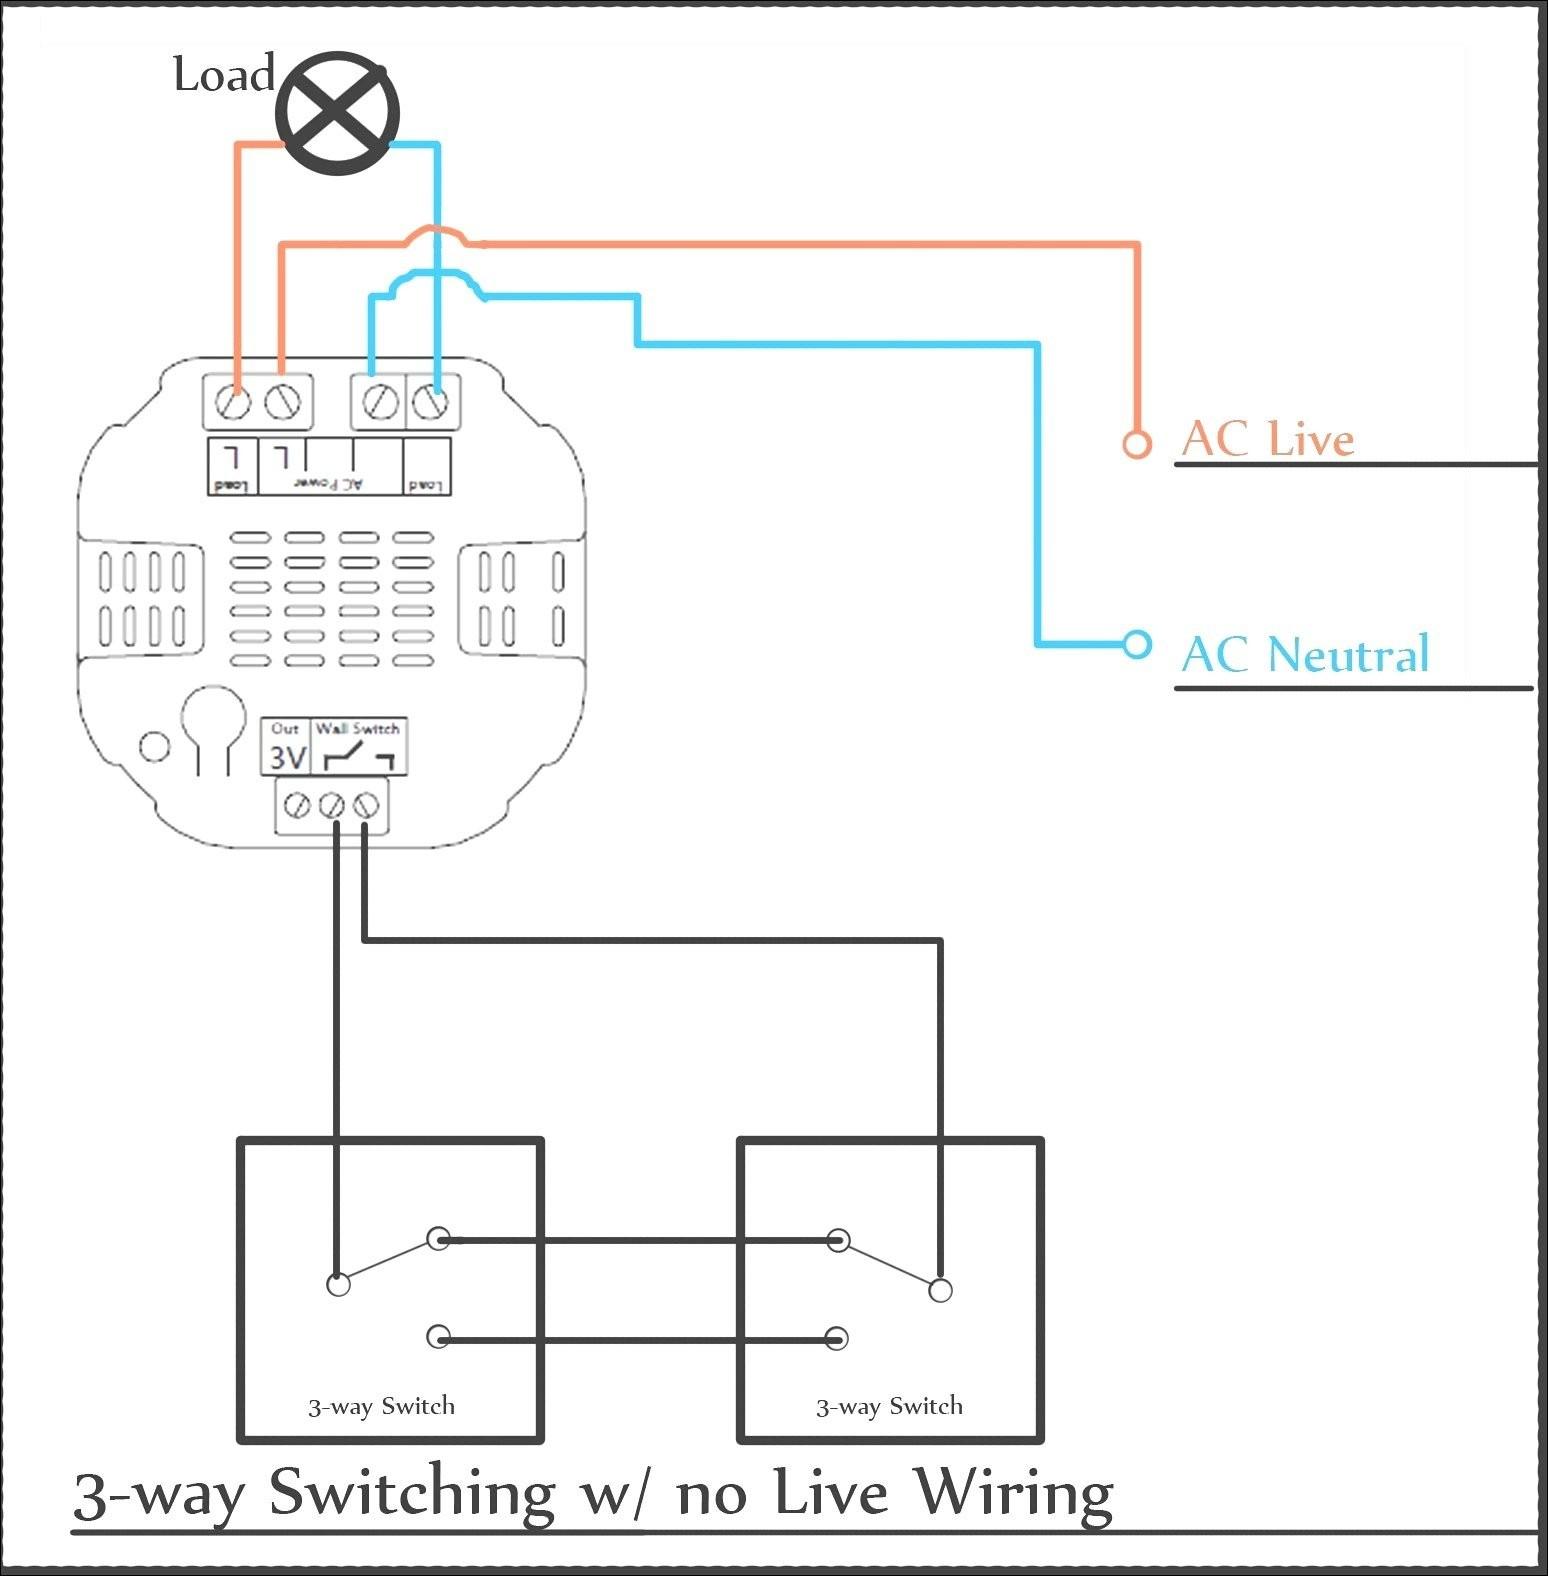 hight resolution of zing ear switch wiring diagram inspirational wiring diagram image zing ear switch ceiling fan part model 1 f552ca zing ear switch wiring diagram hampton bay